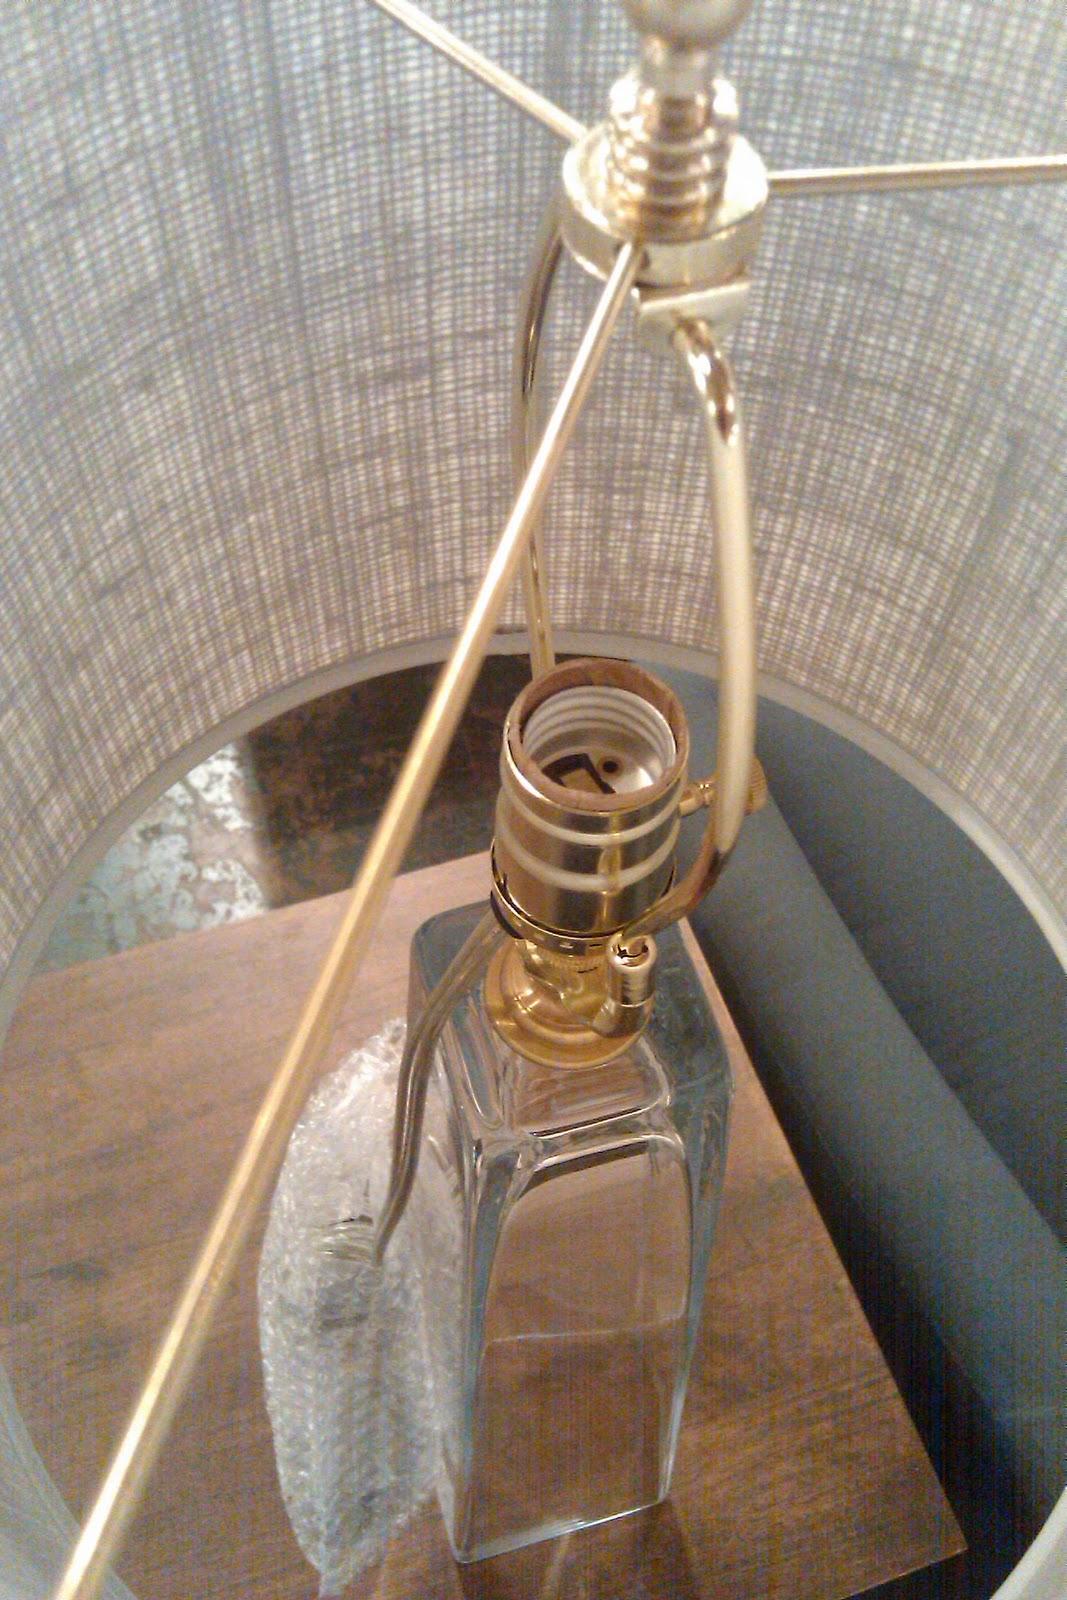 Diy Lamp Remodelaholic Diy Lamp Kits On Vases